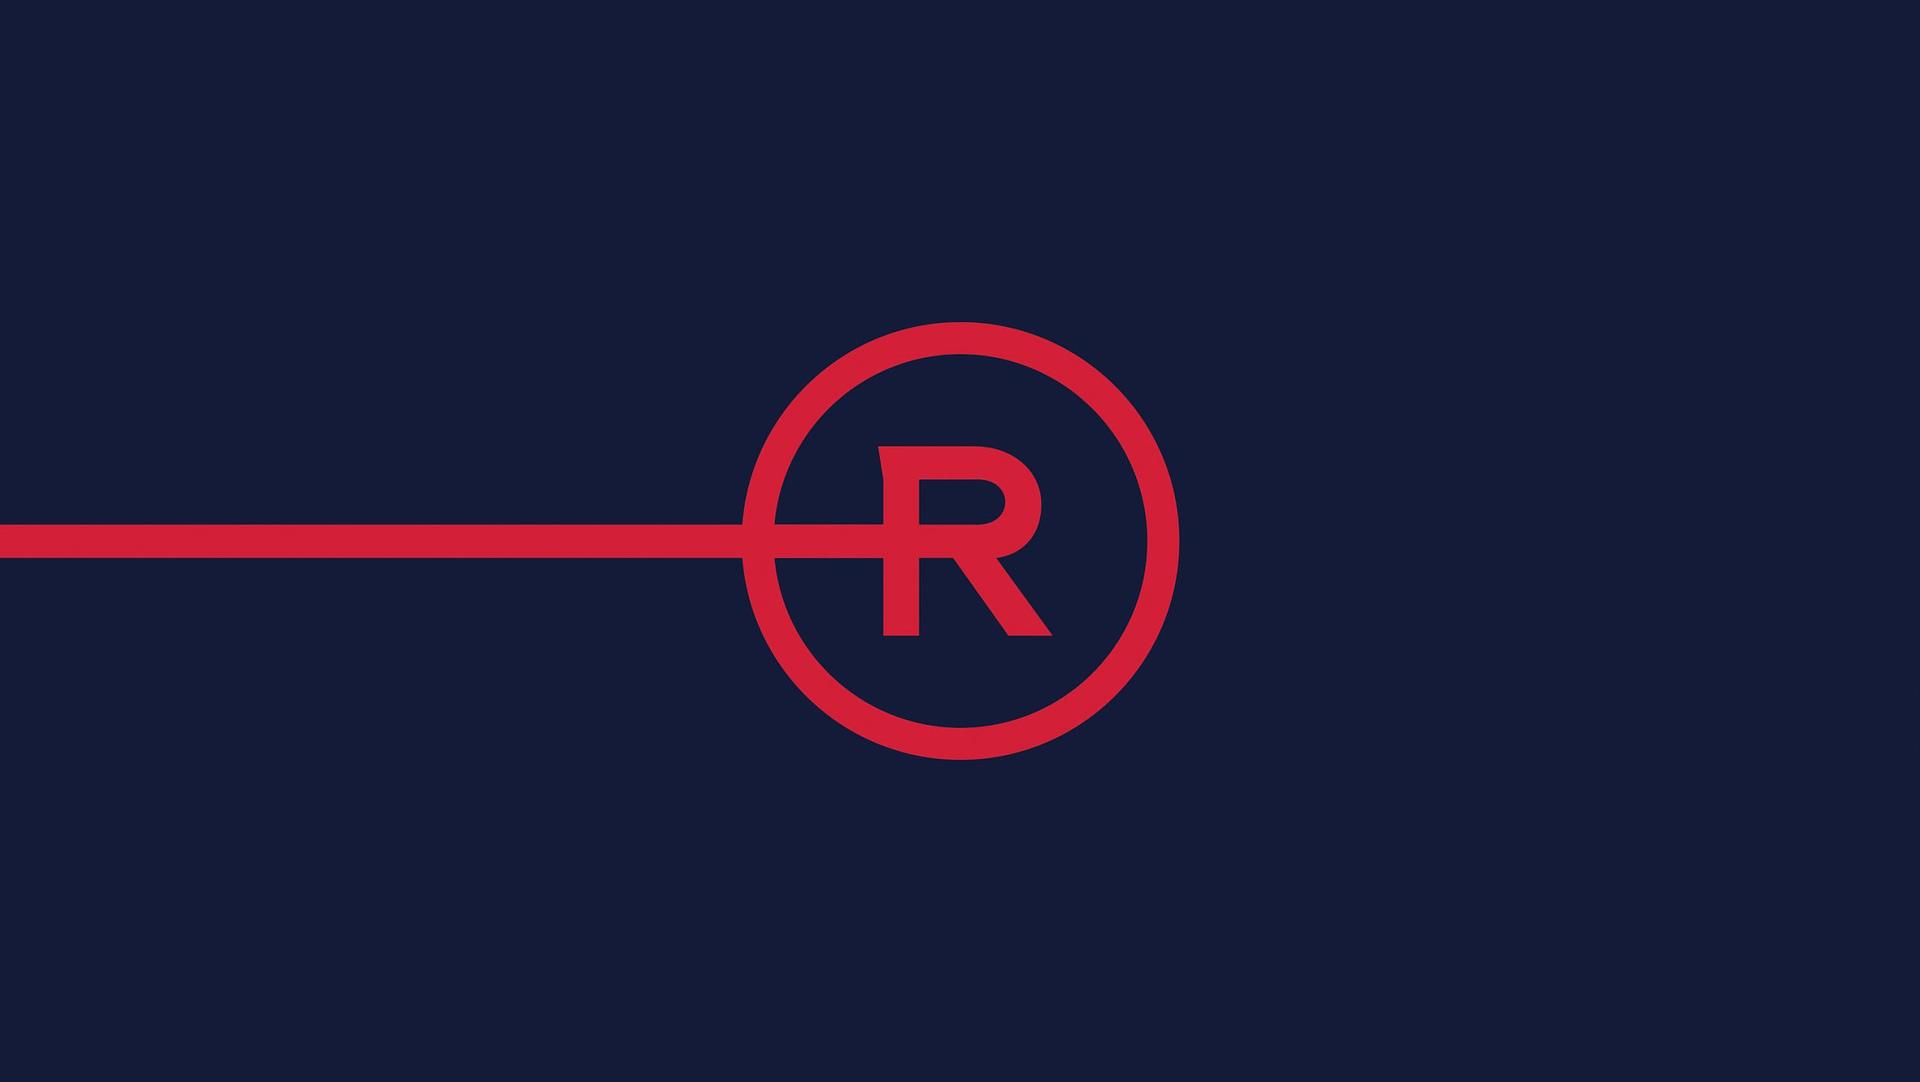 RedRoad logo1lc